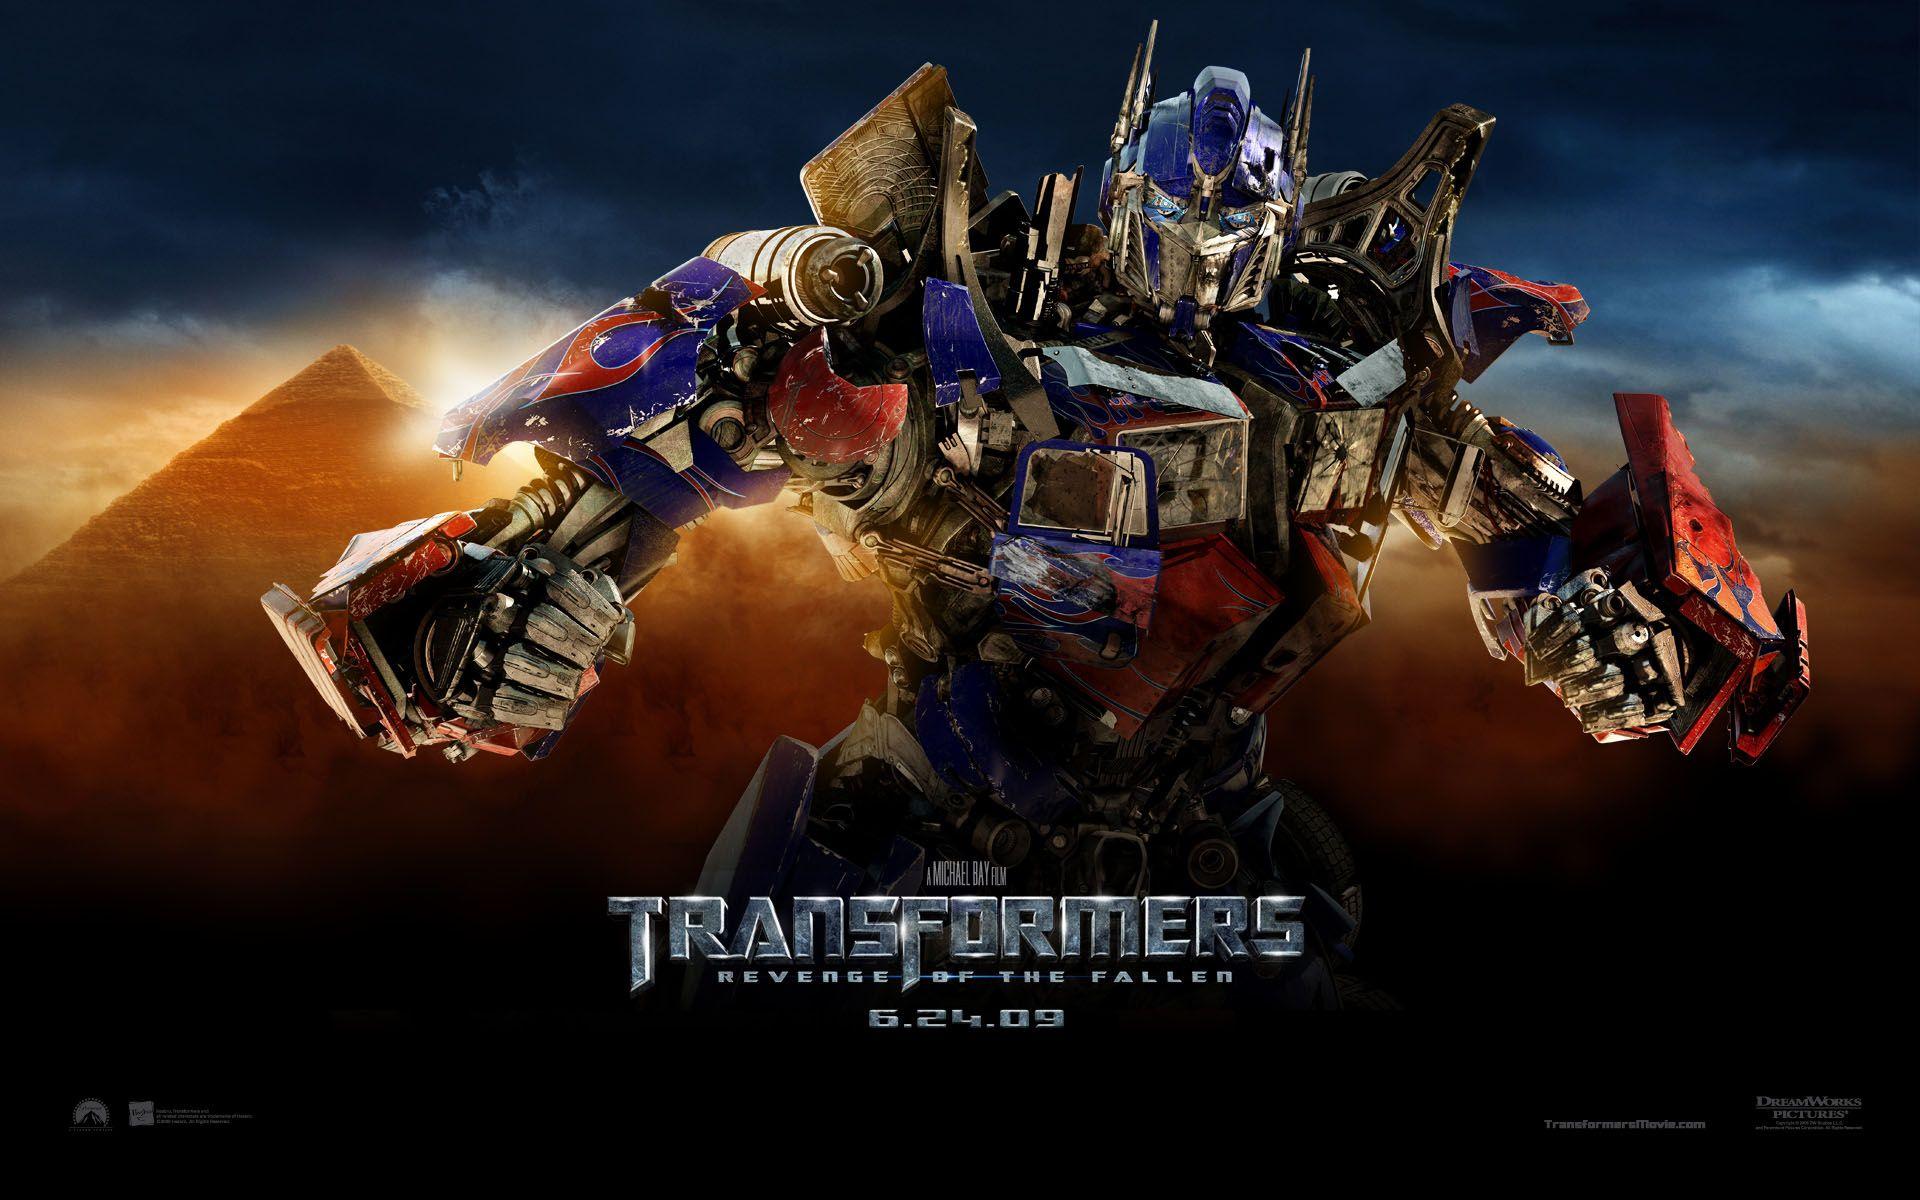 Transformers Revenge Of The Fallen Wallpaper Transformers